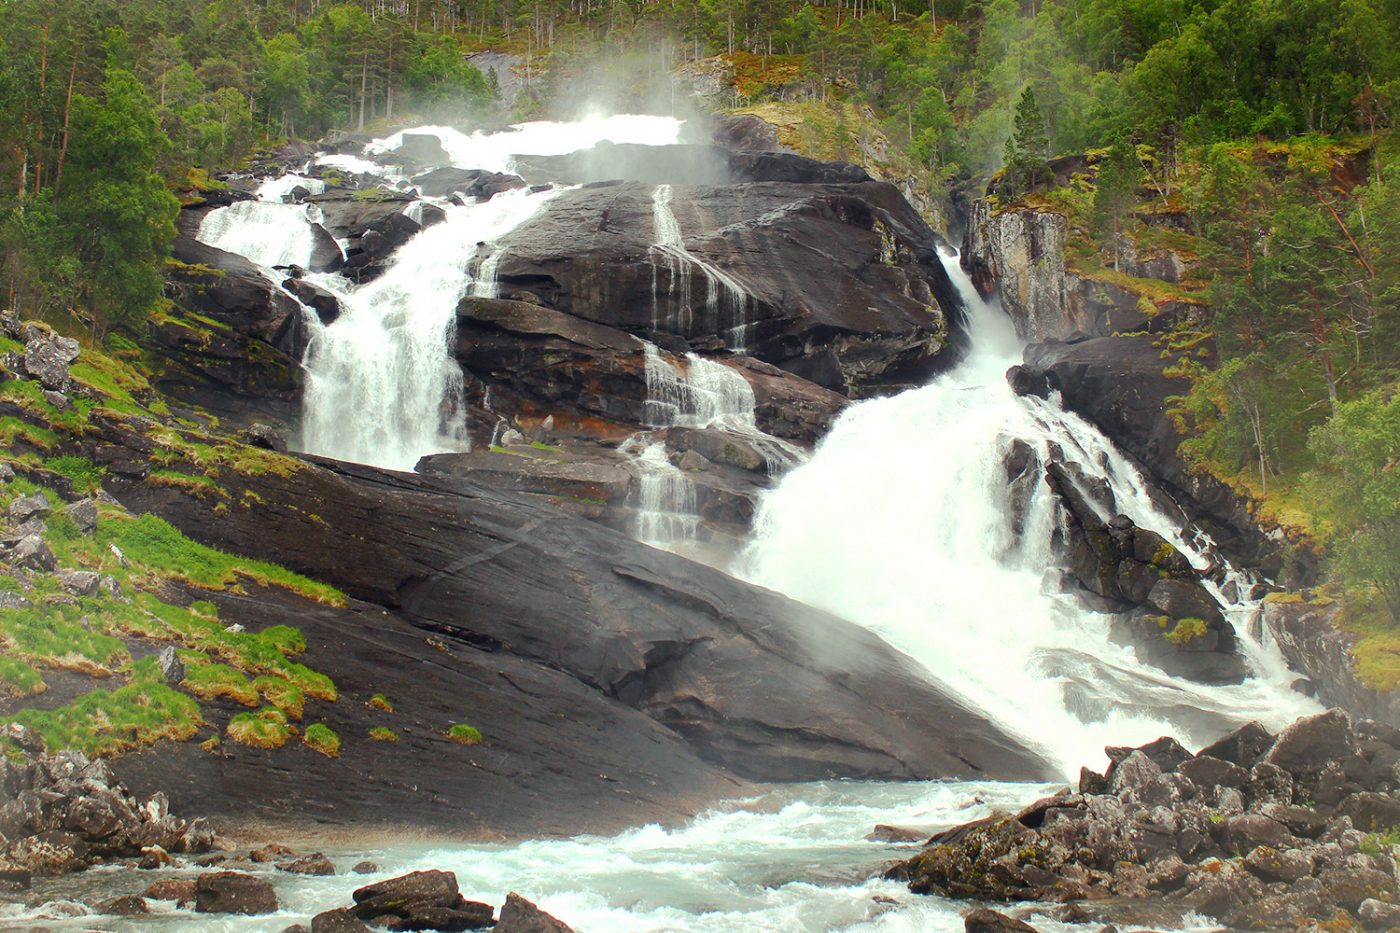 Der Wasserfall Tveitafossen in Norwegen.